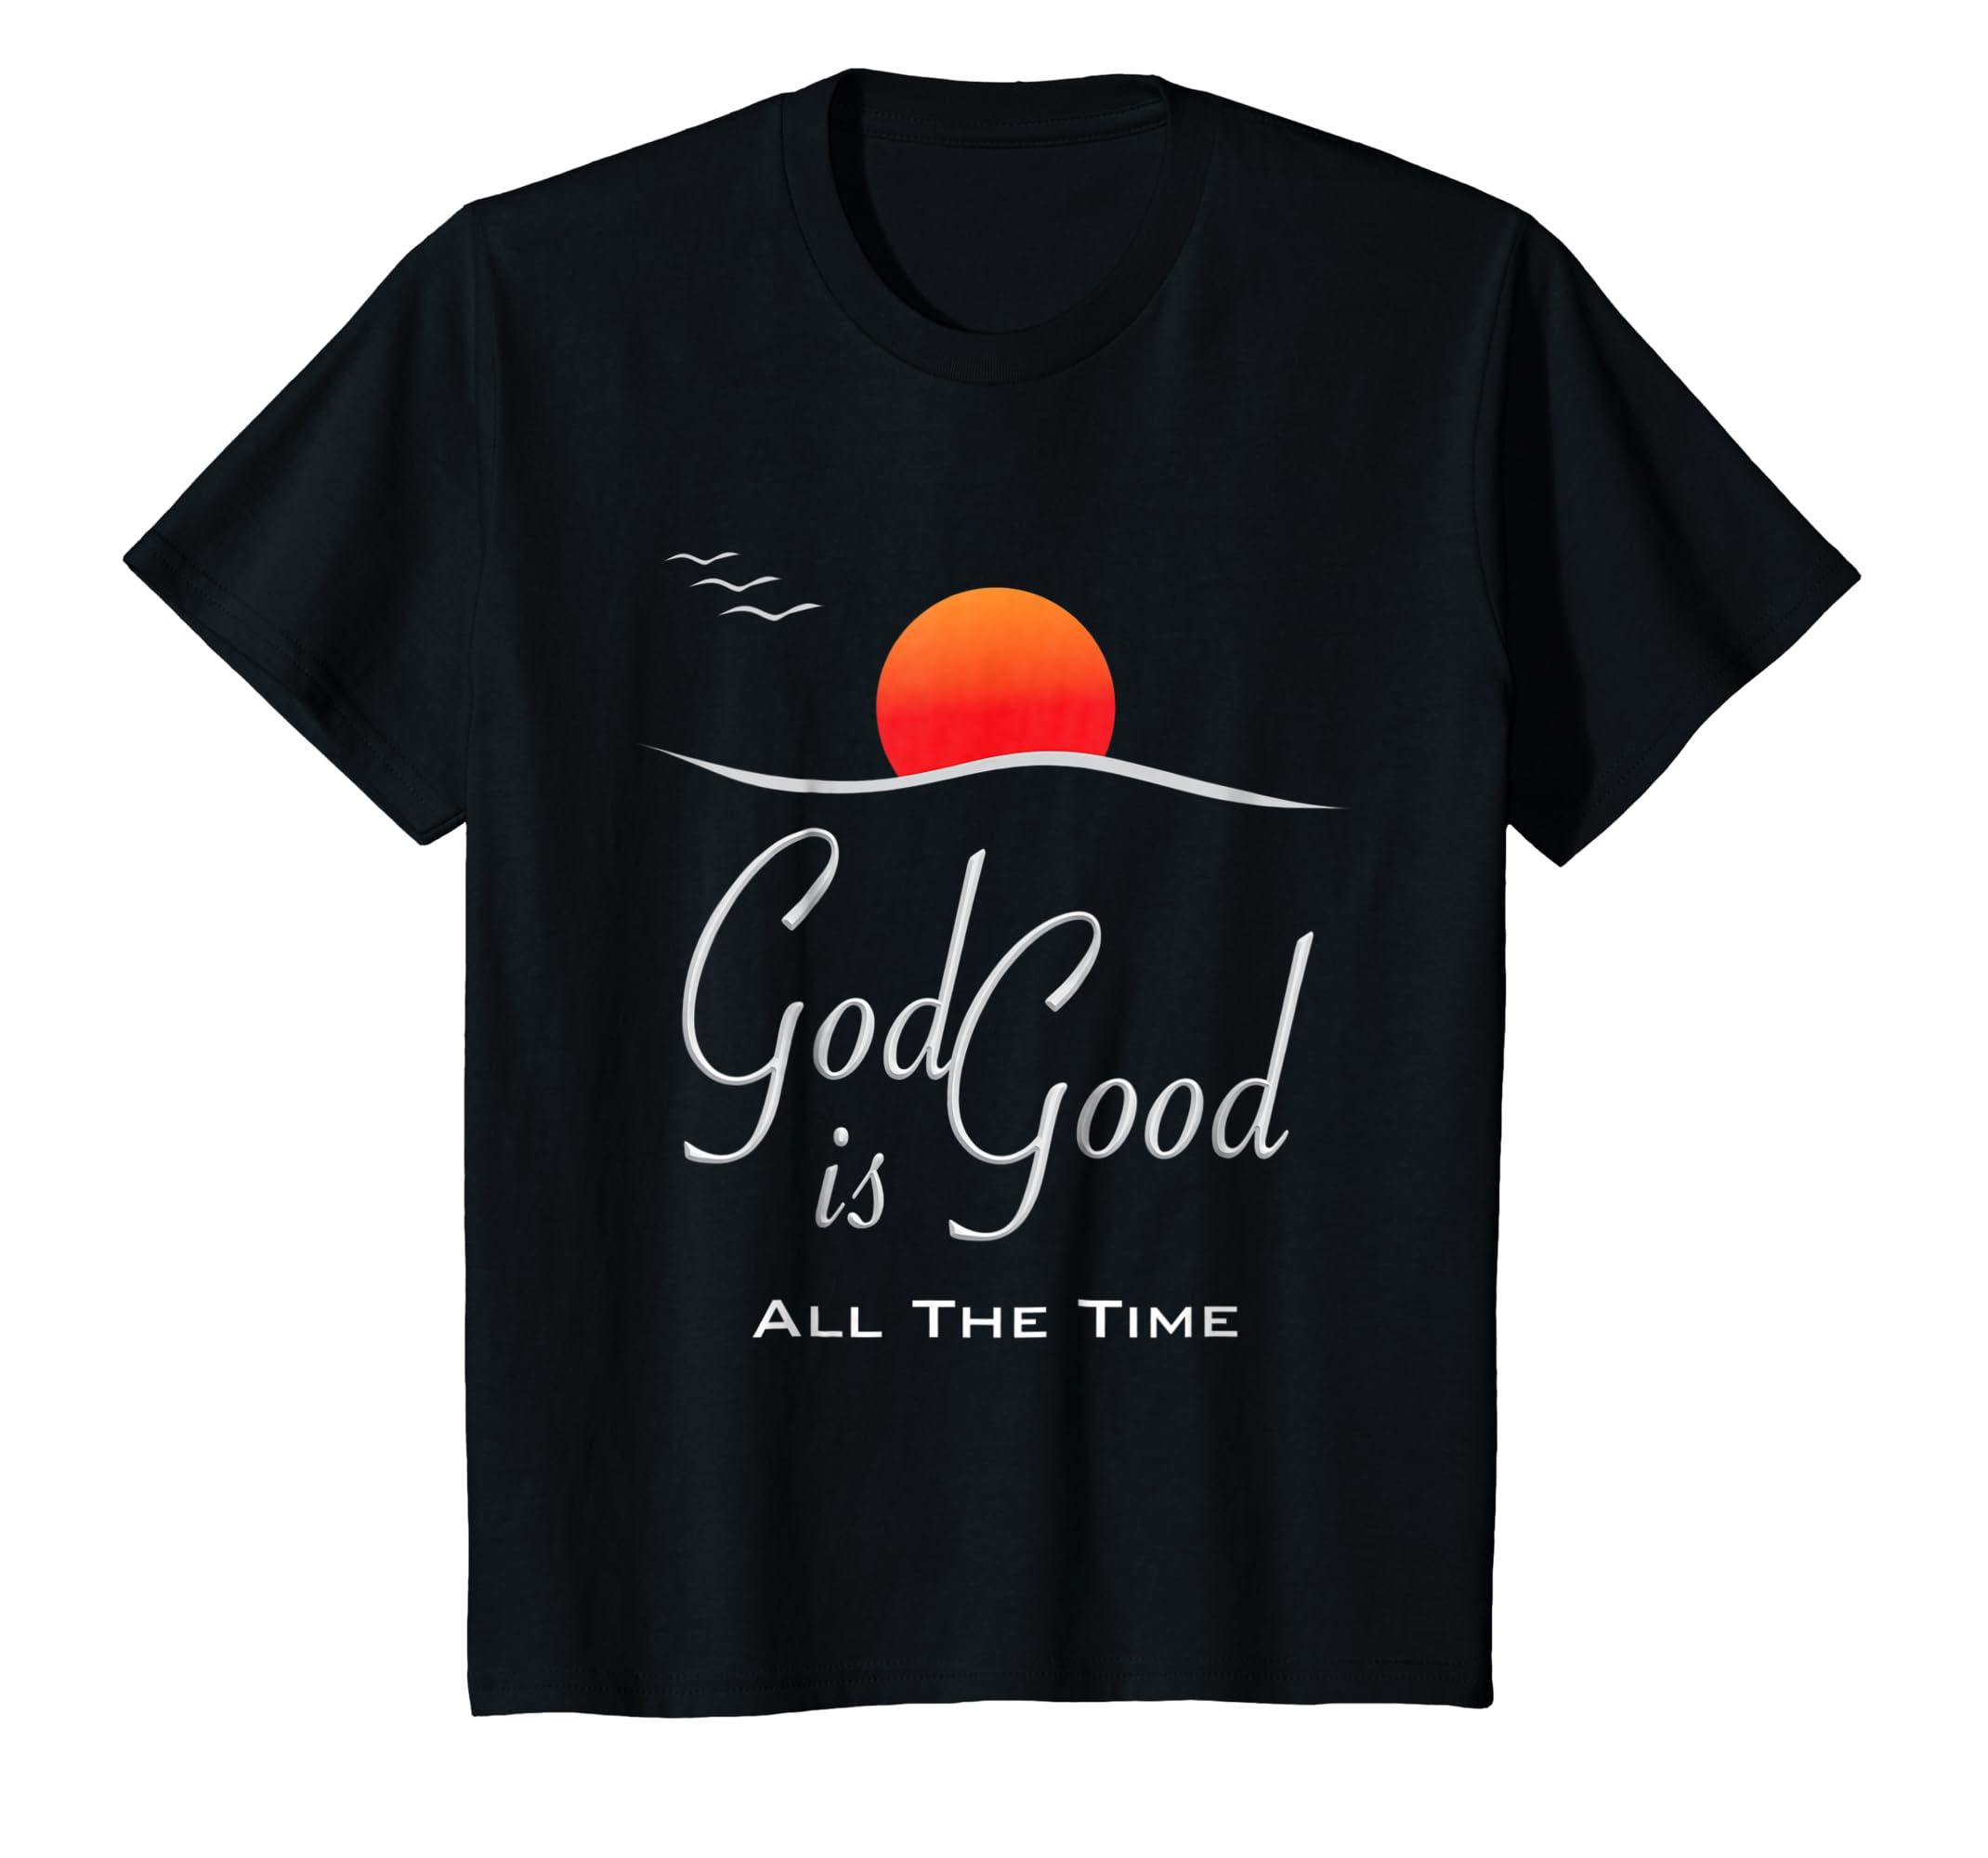 God is Good Tshirt Christian Jesus Shirt Church Christ Gift